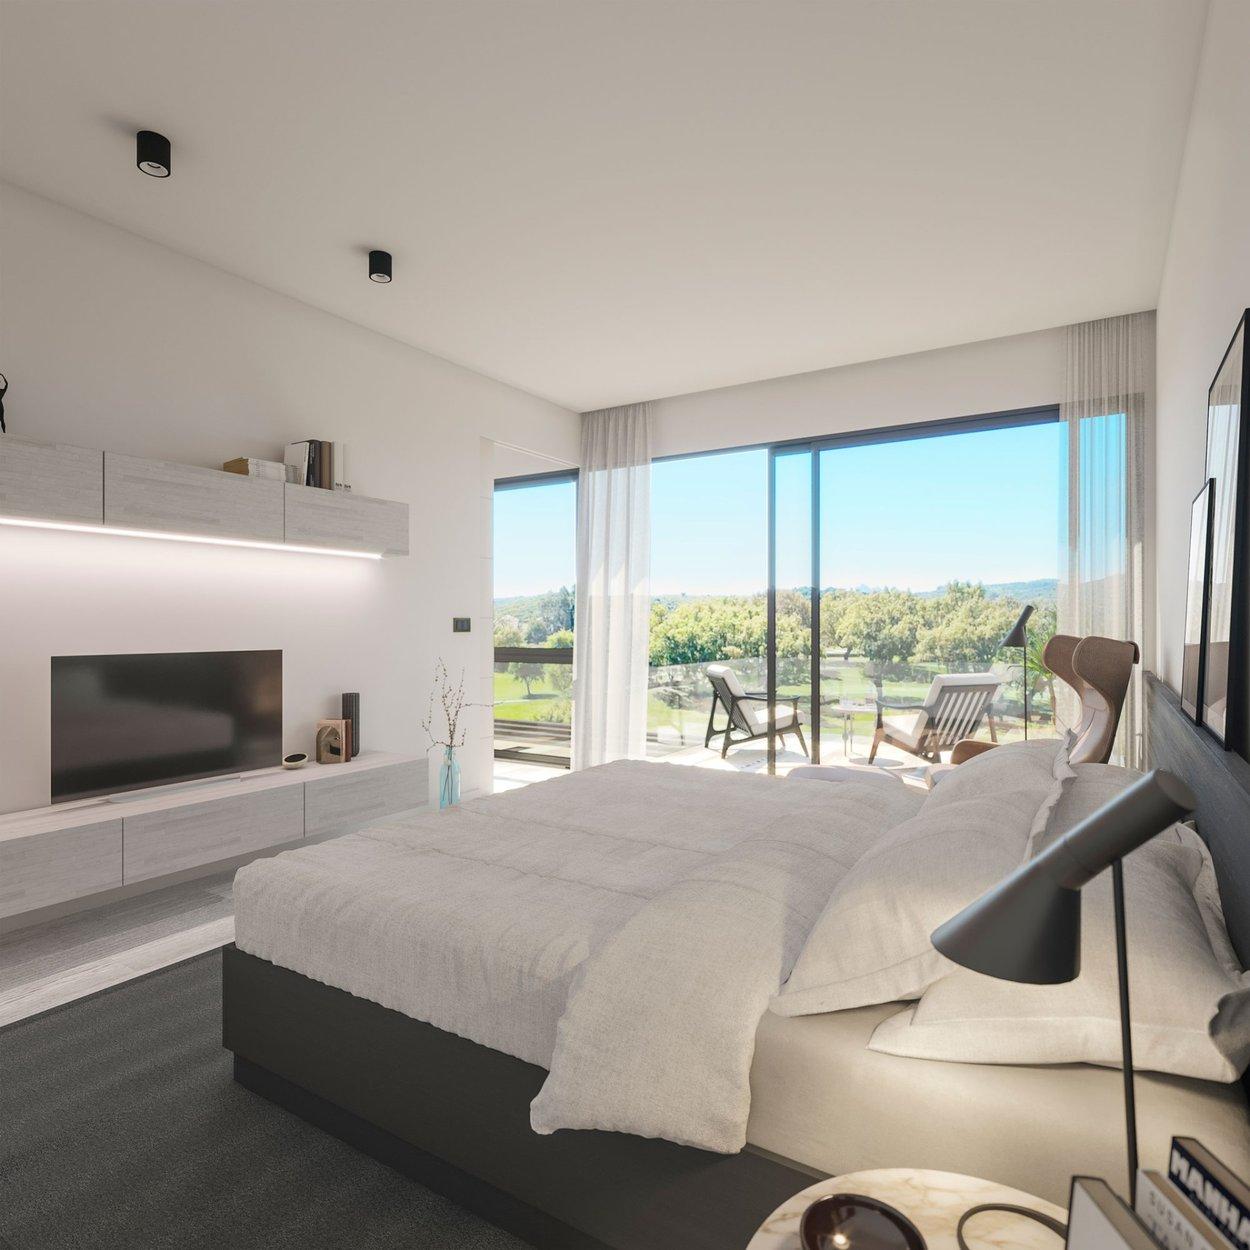 3 Bedroom, 3 Bathroom Townhouse For Sale In San Roque